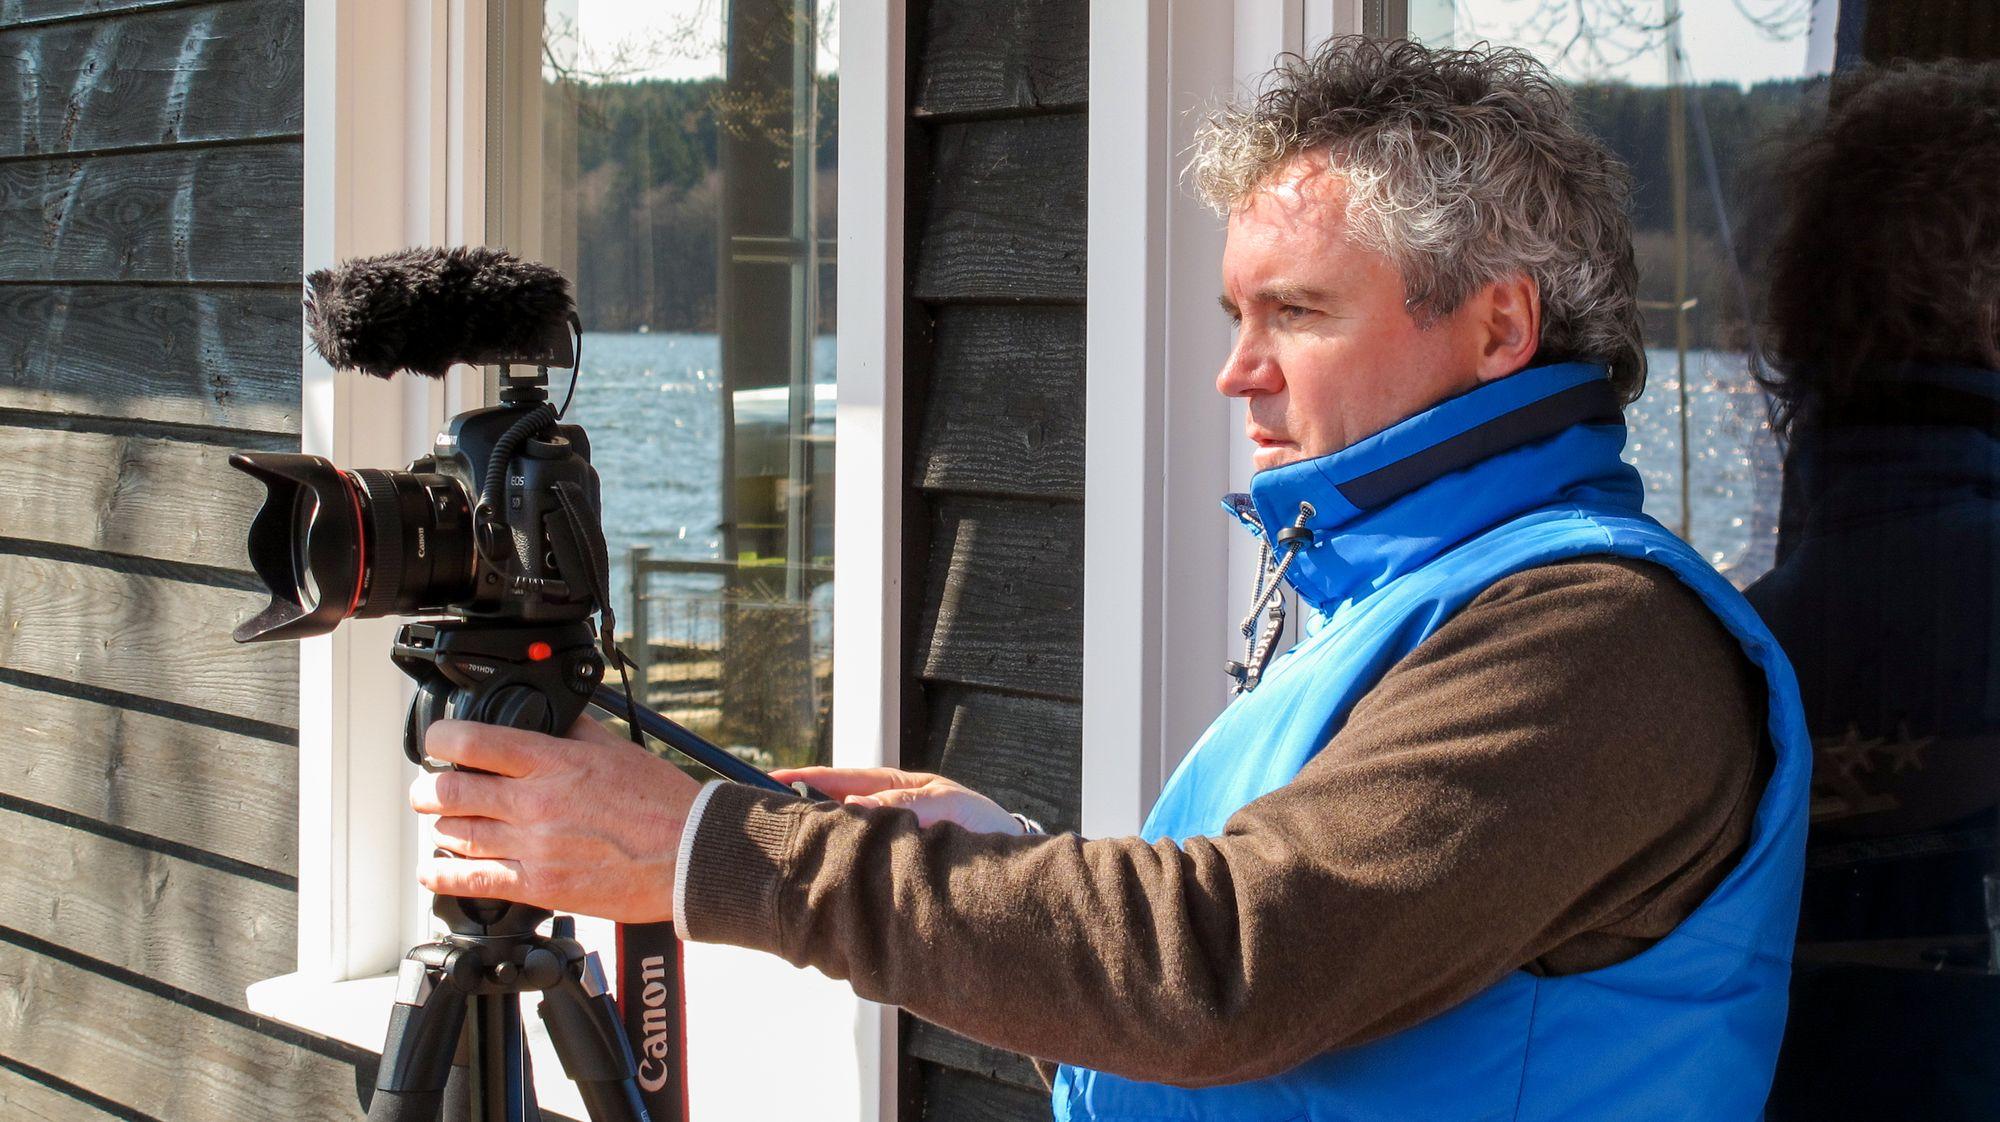 Fotograf Svend Krumnacker 2011 Canon 5D II 24mm/1.4 L